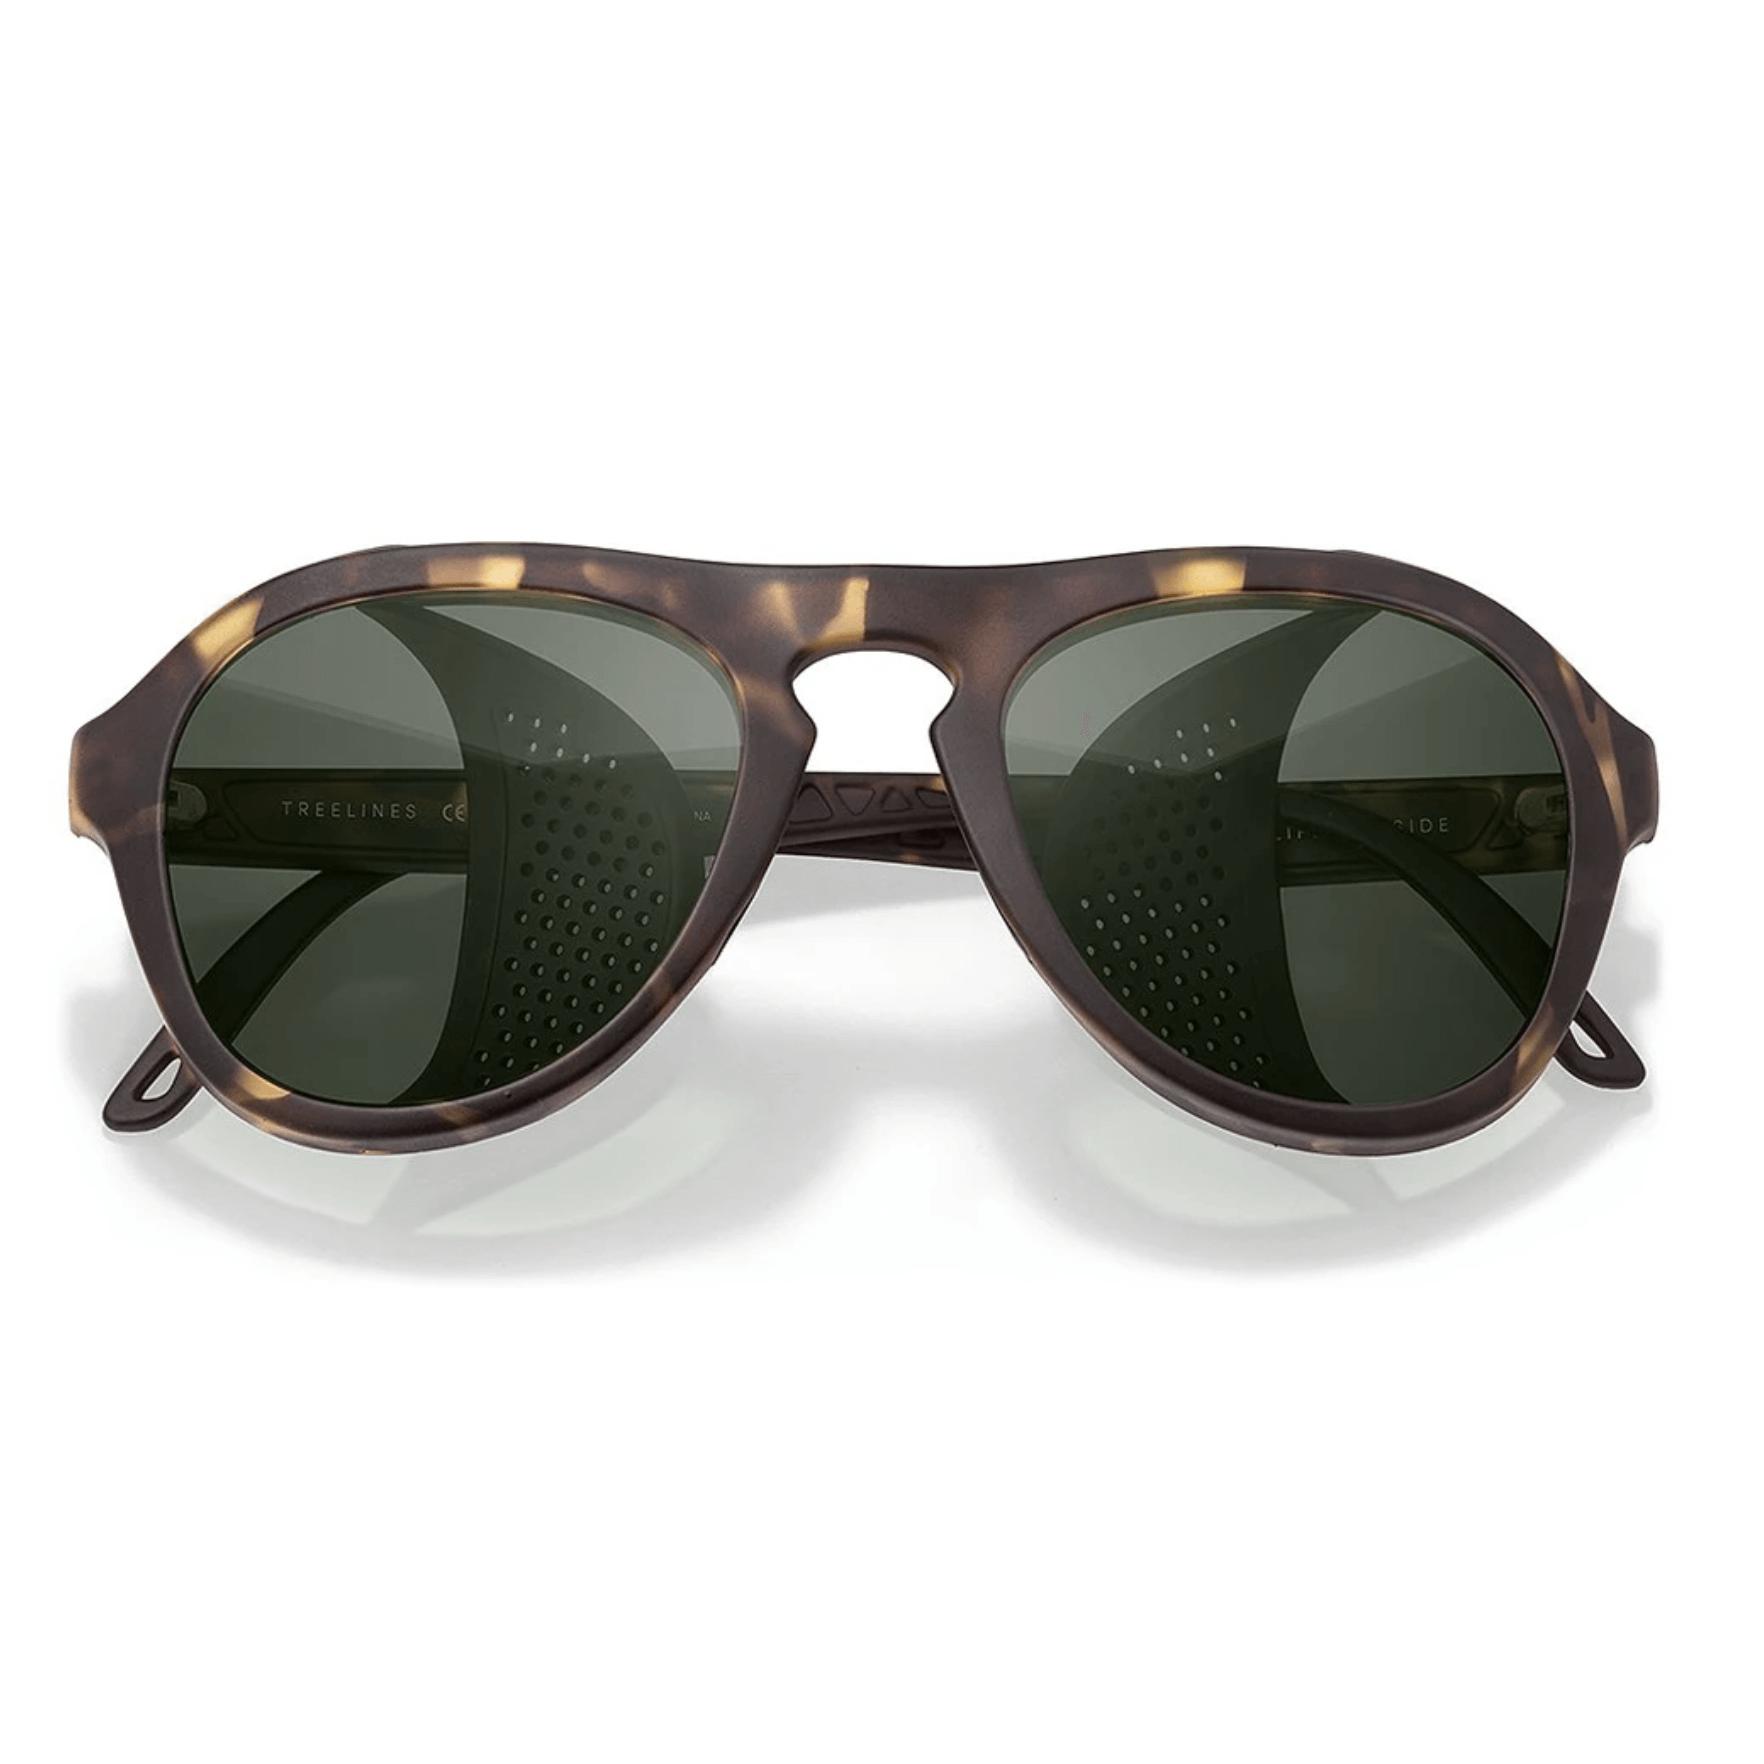 stylish green sunglasses